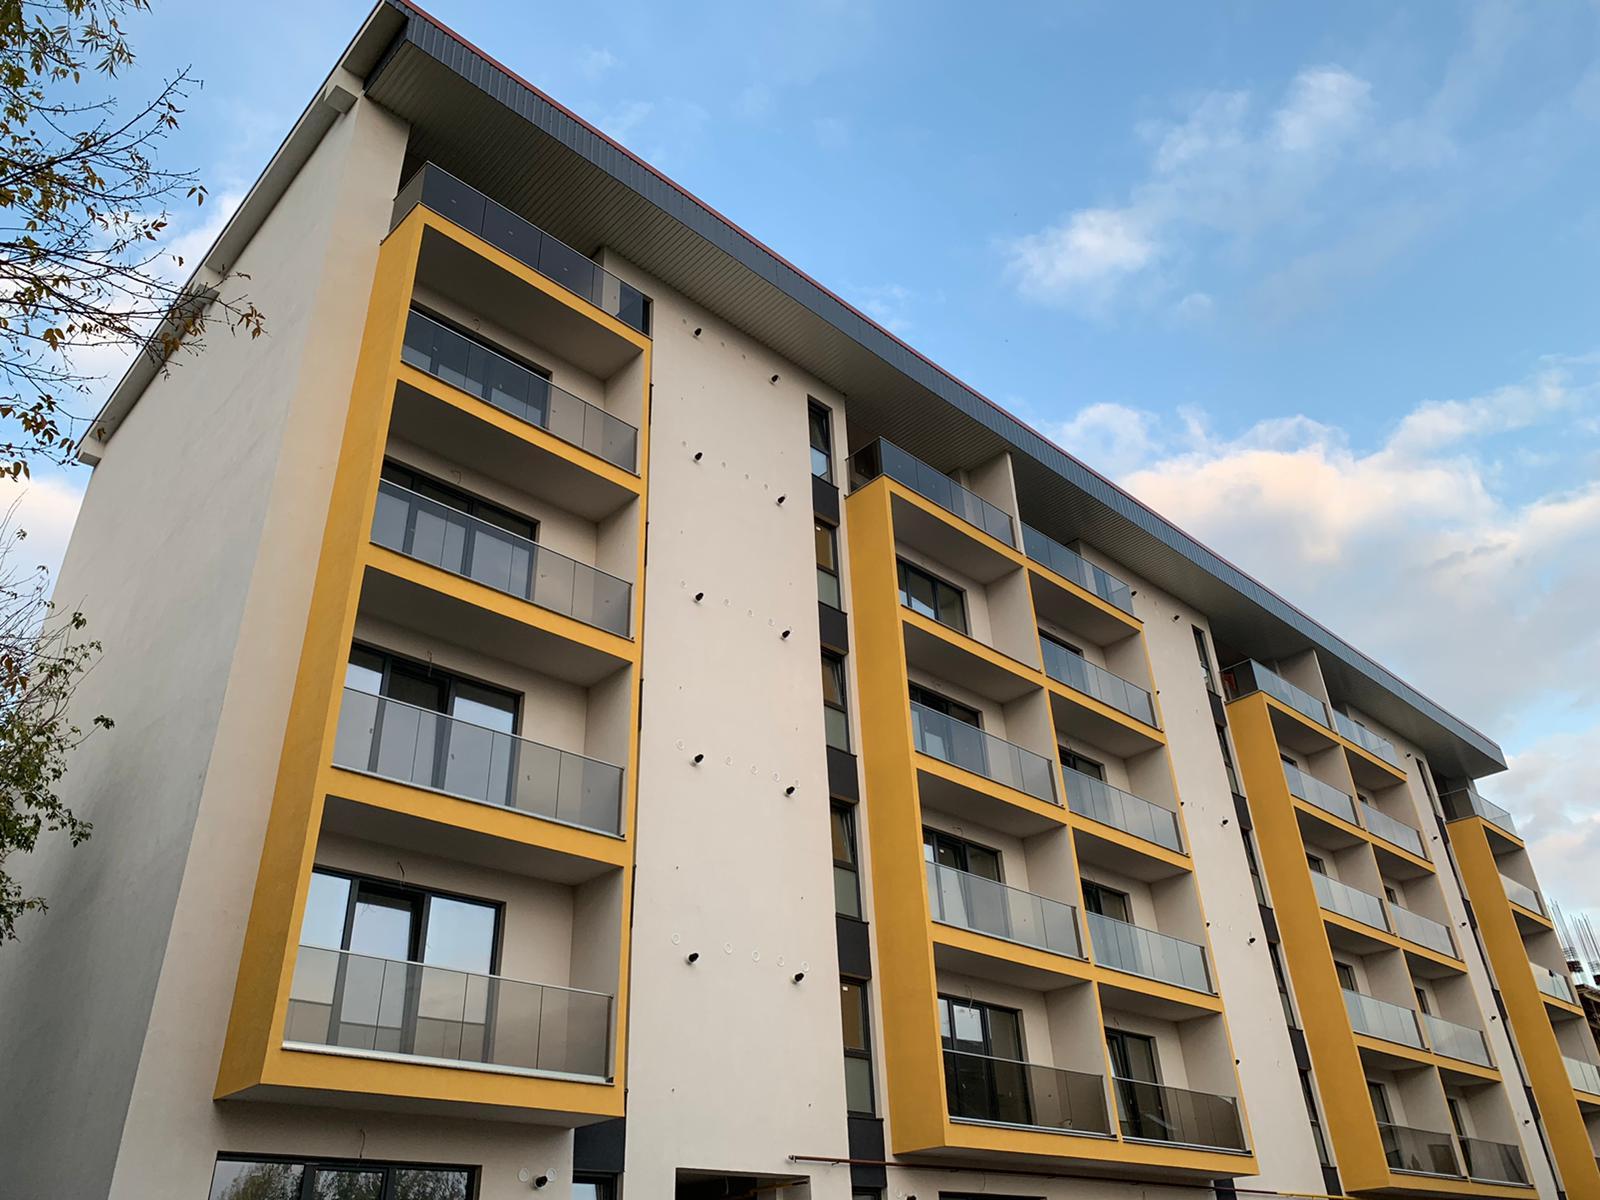 Construcții Civile și Industriale UrBAN House 1